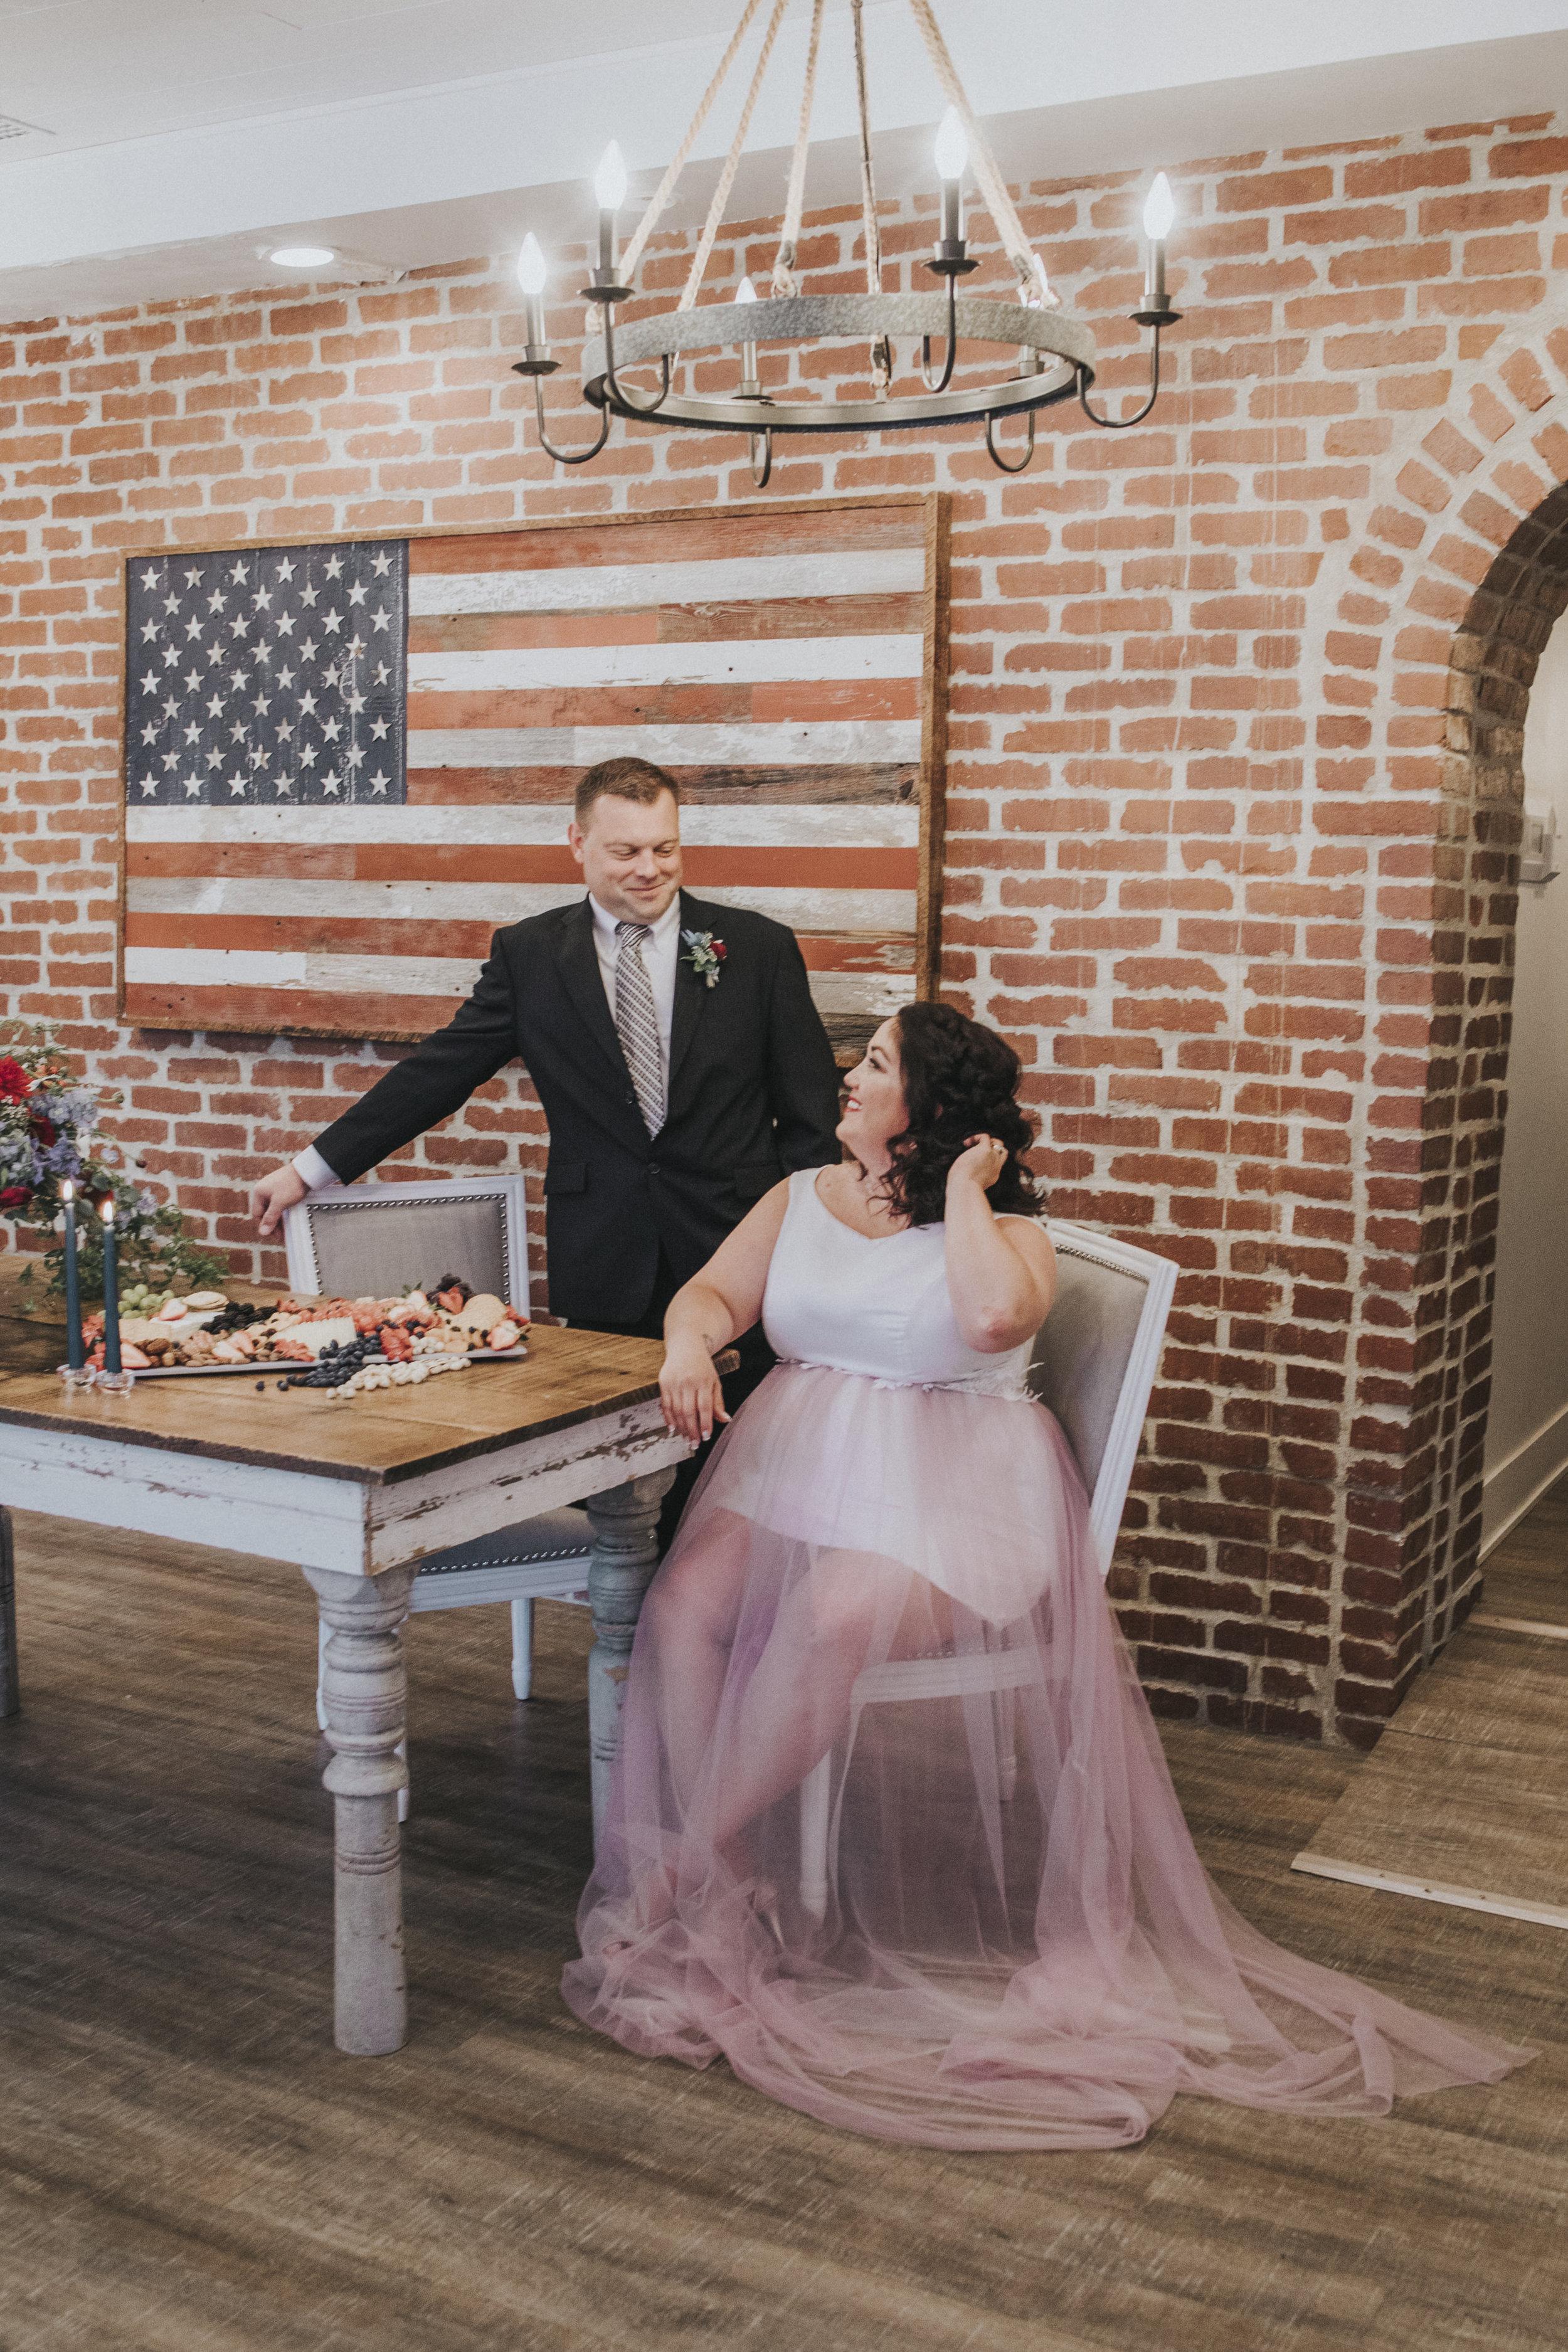 54 midwest-colorado-nebraska-elopement-photography-gretna-turtledoves.jpg